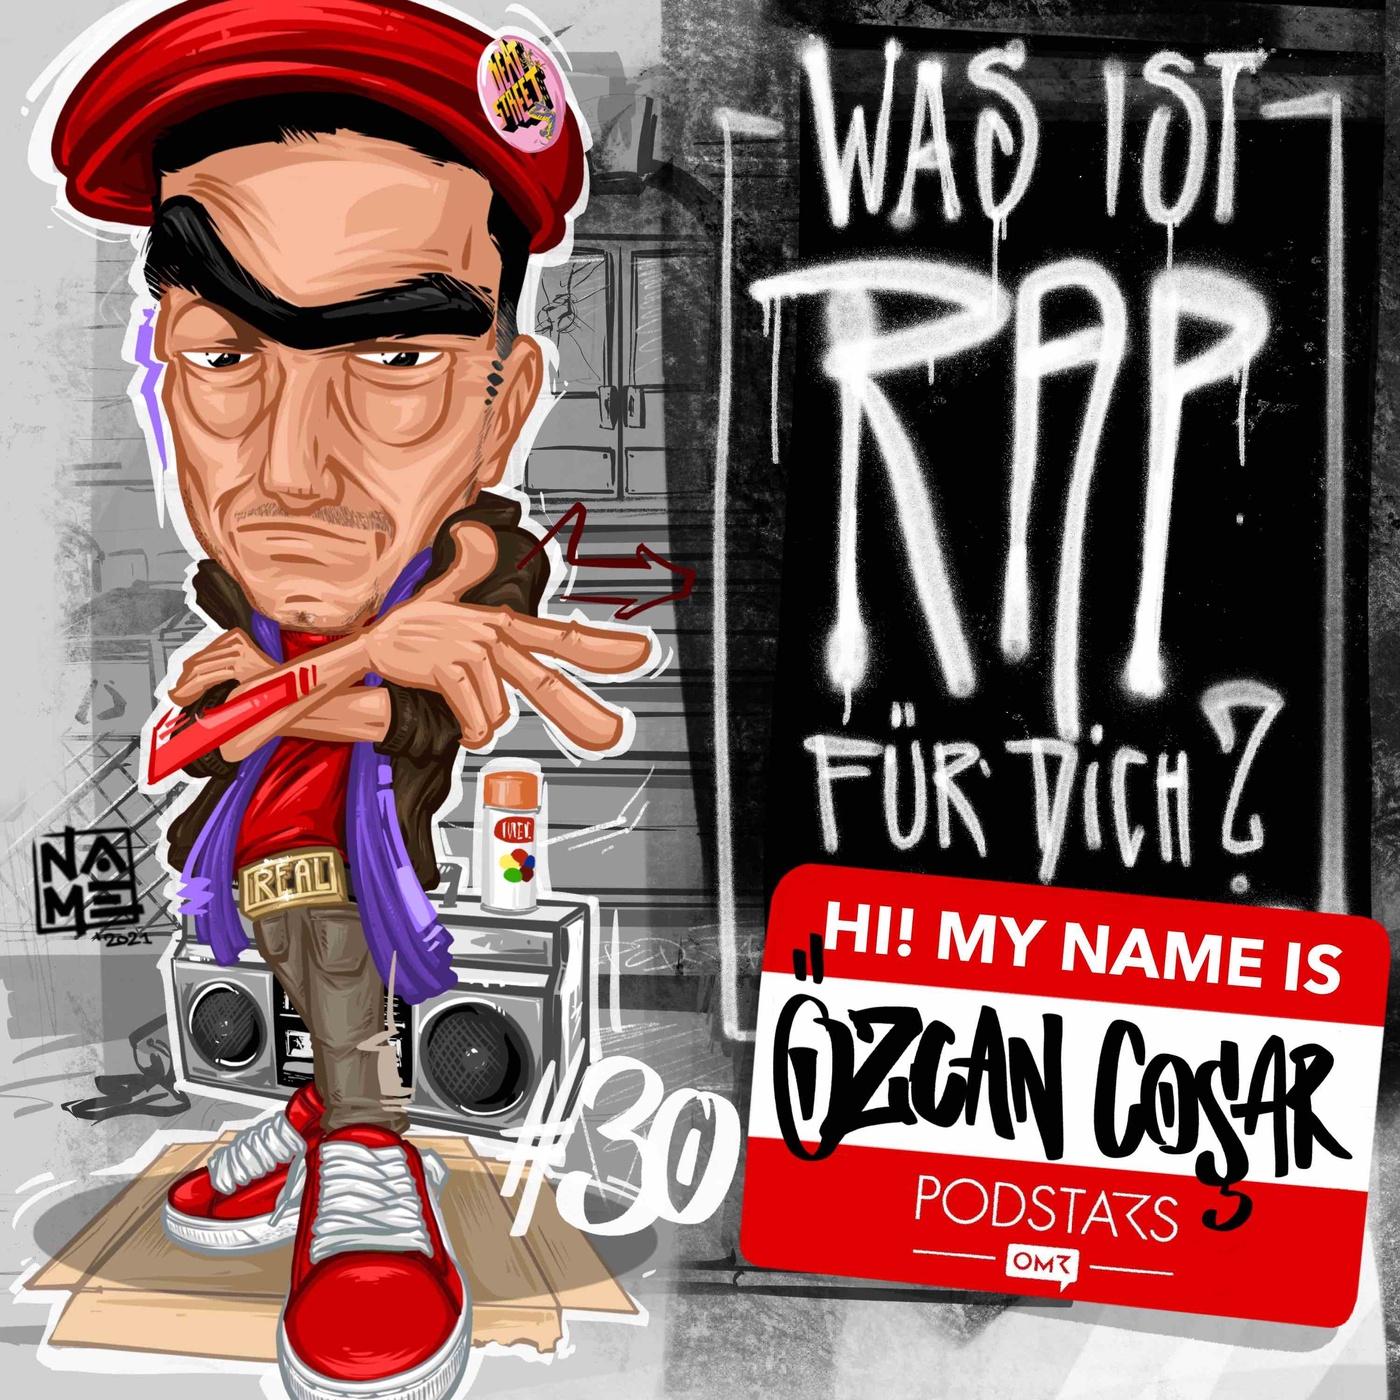 Özcan Coşar – Hip Hop kann man nicht ablegen, es ist in dir